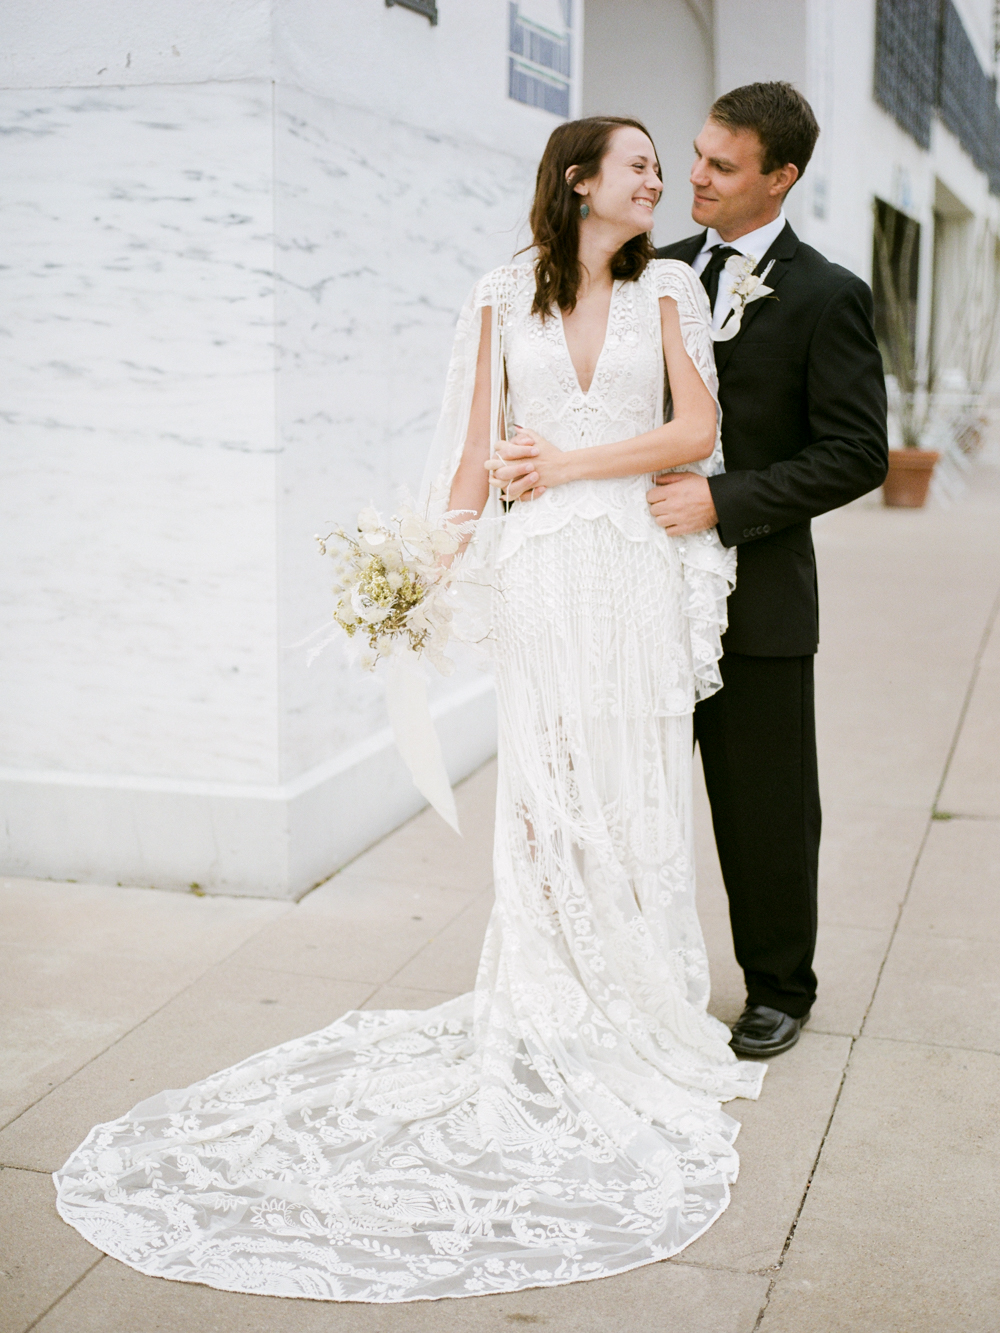 Marfa wedding photographer- destination wedding photographer-christine gosch - film photographer - elopement photographer-22.jpg